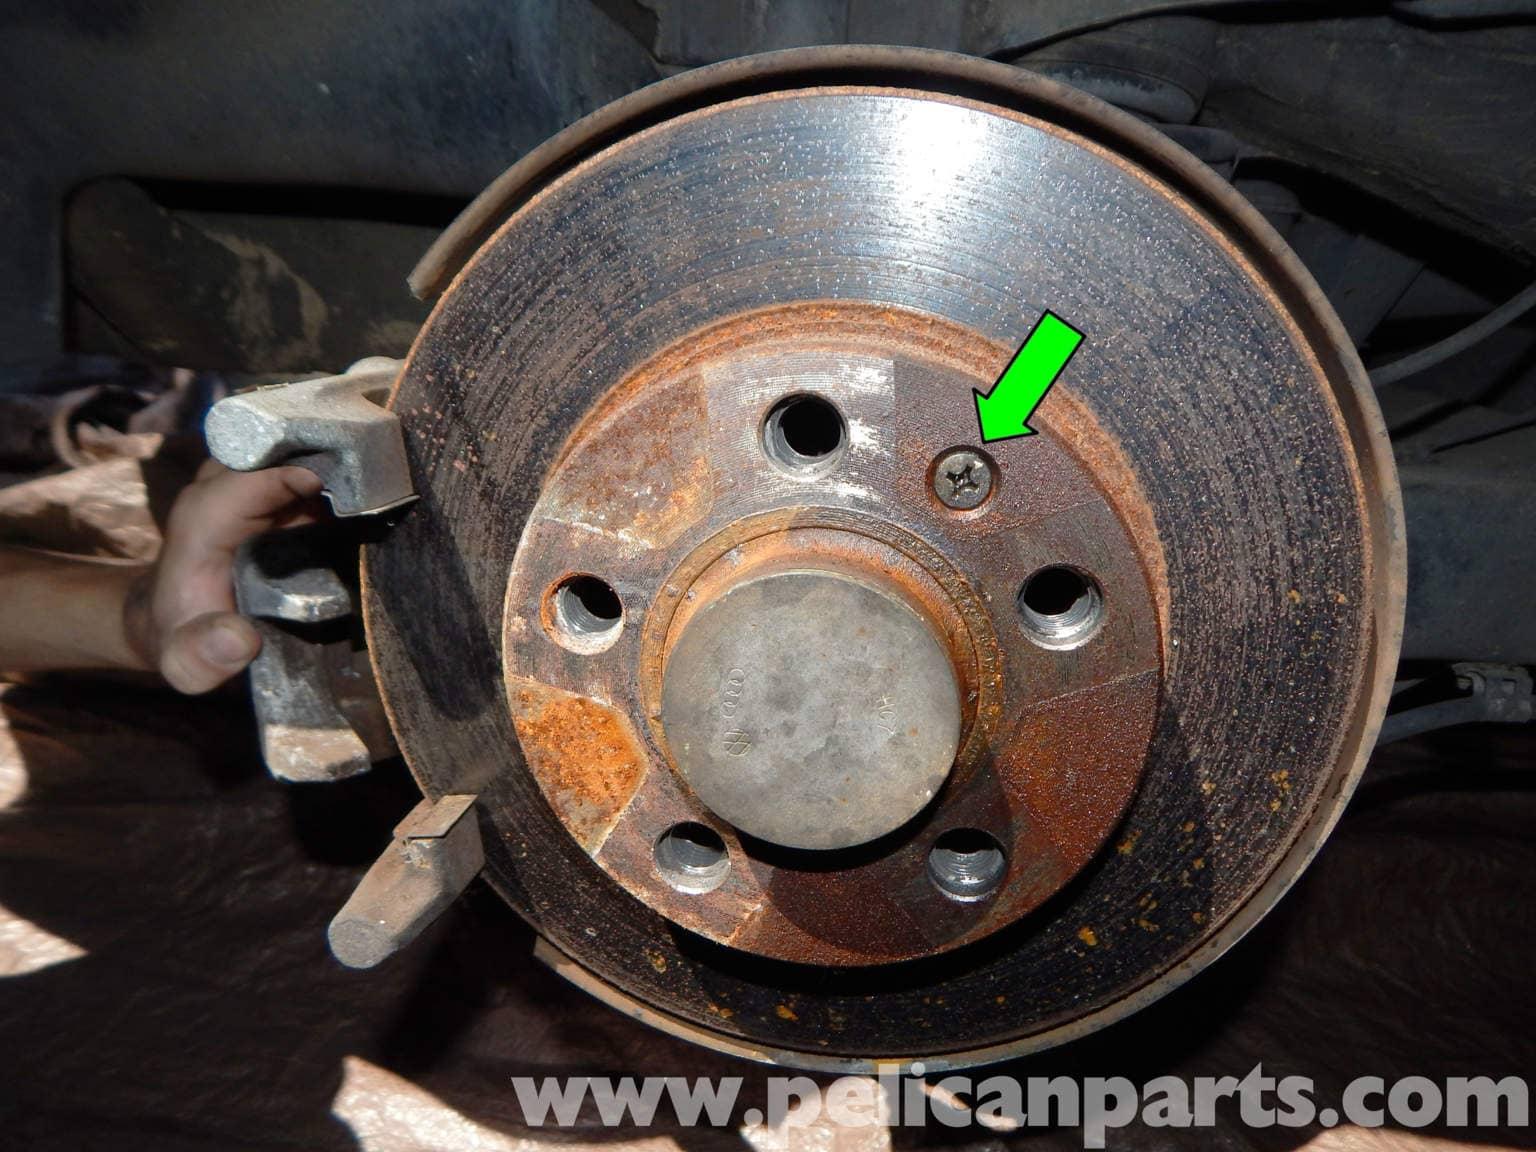 volkswagen jetta mk rear brake rotor replacement jetta mk    pelican parts